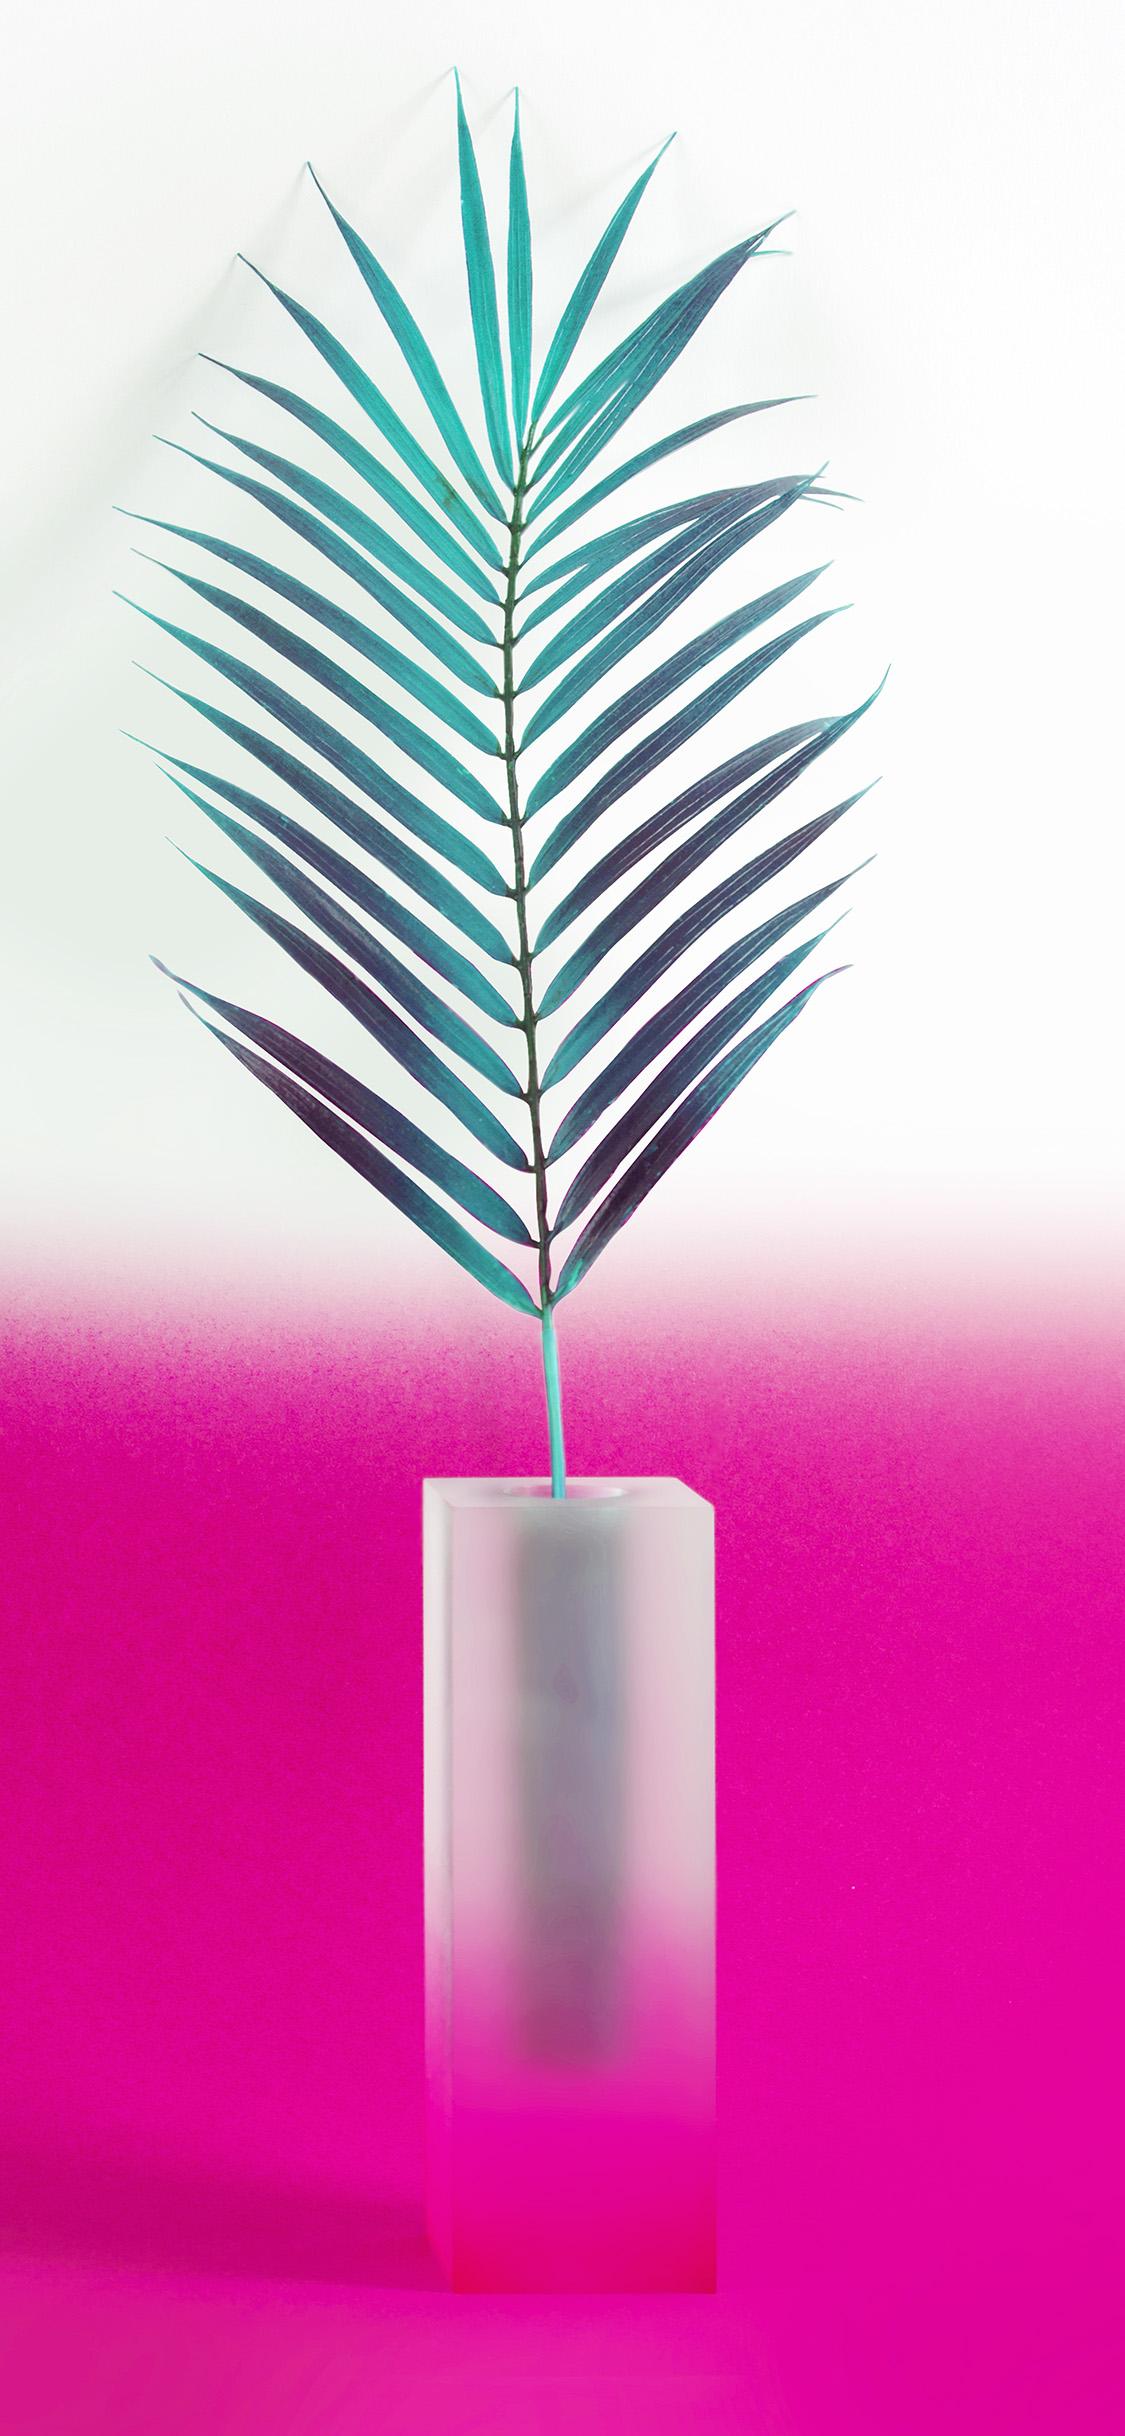 iPhonexpapers.com-Apple-iPhone-wallpaper-bc93-plant-pink-minimal-home-art-illustration